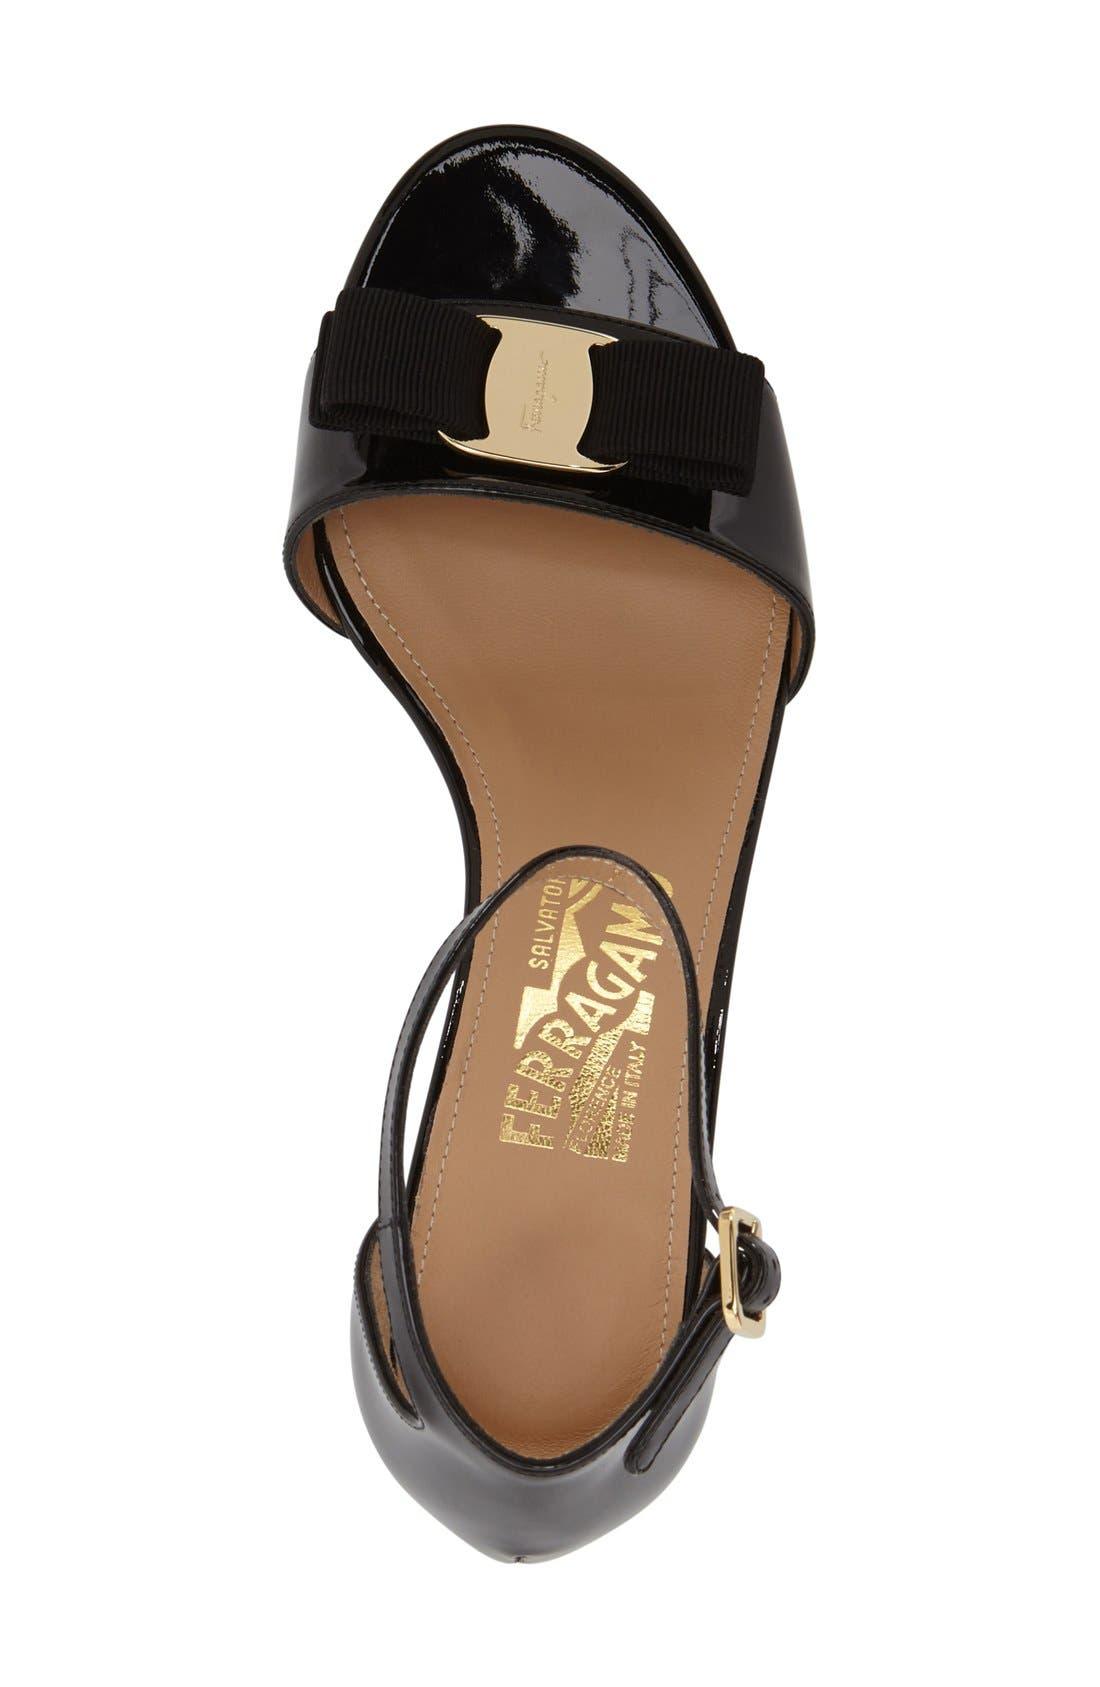 Gavina Block Heel Bow Sandal,                             Alternate thumbnail 3, color,                             Black Patent